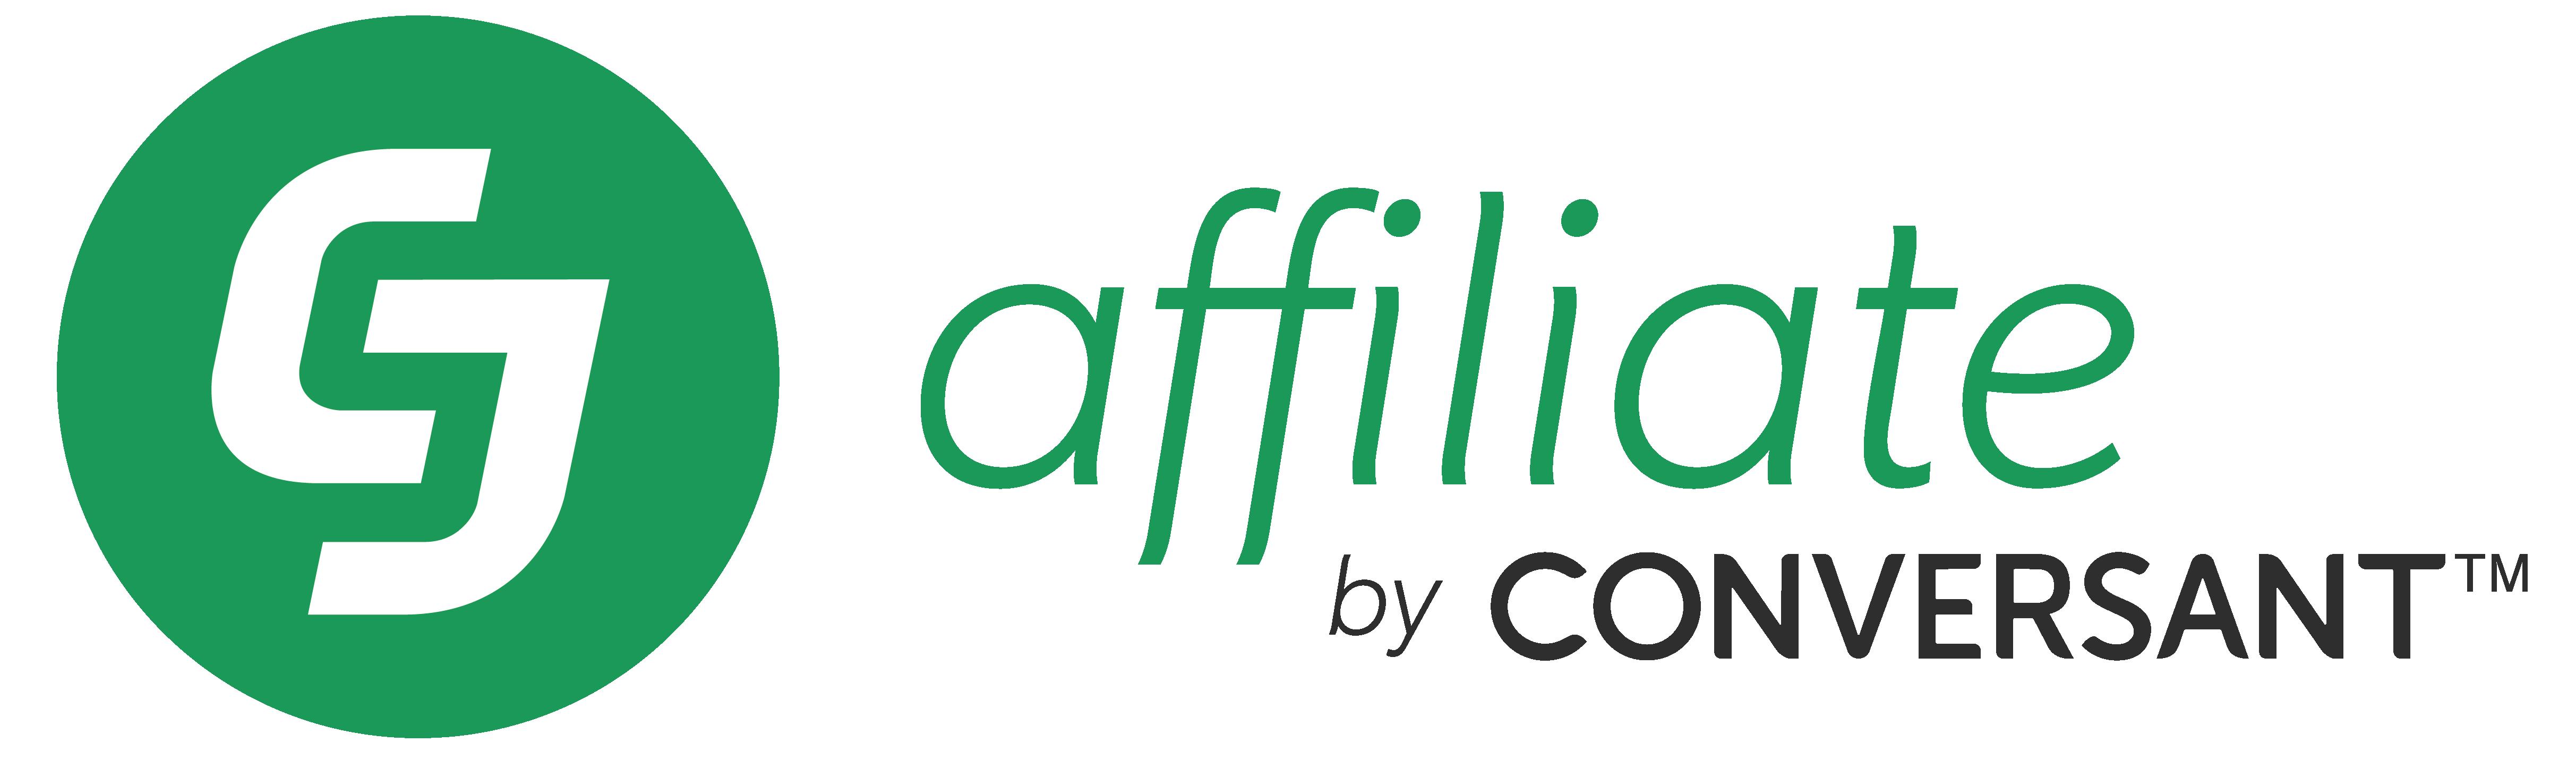 commission-junction-logo